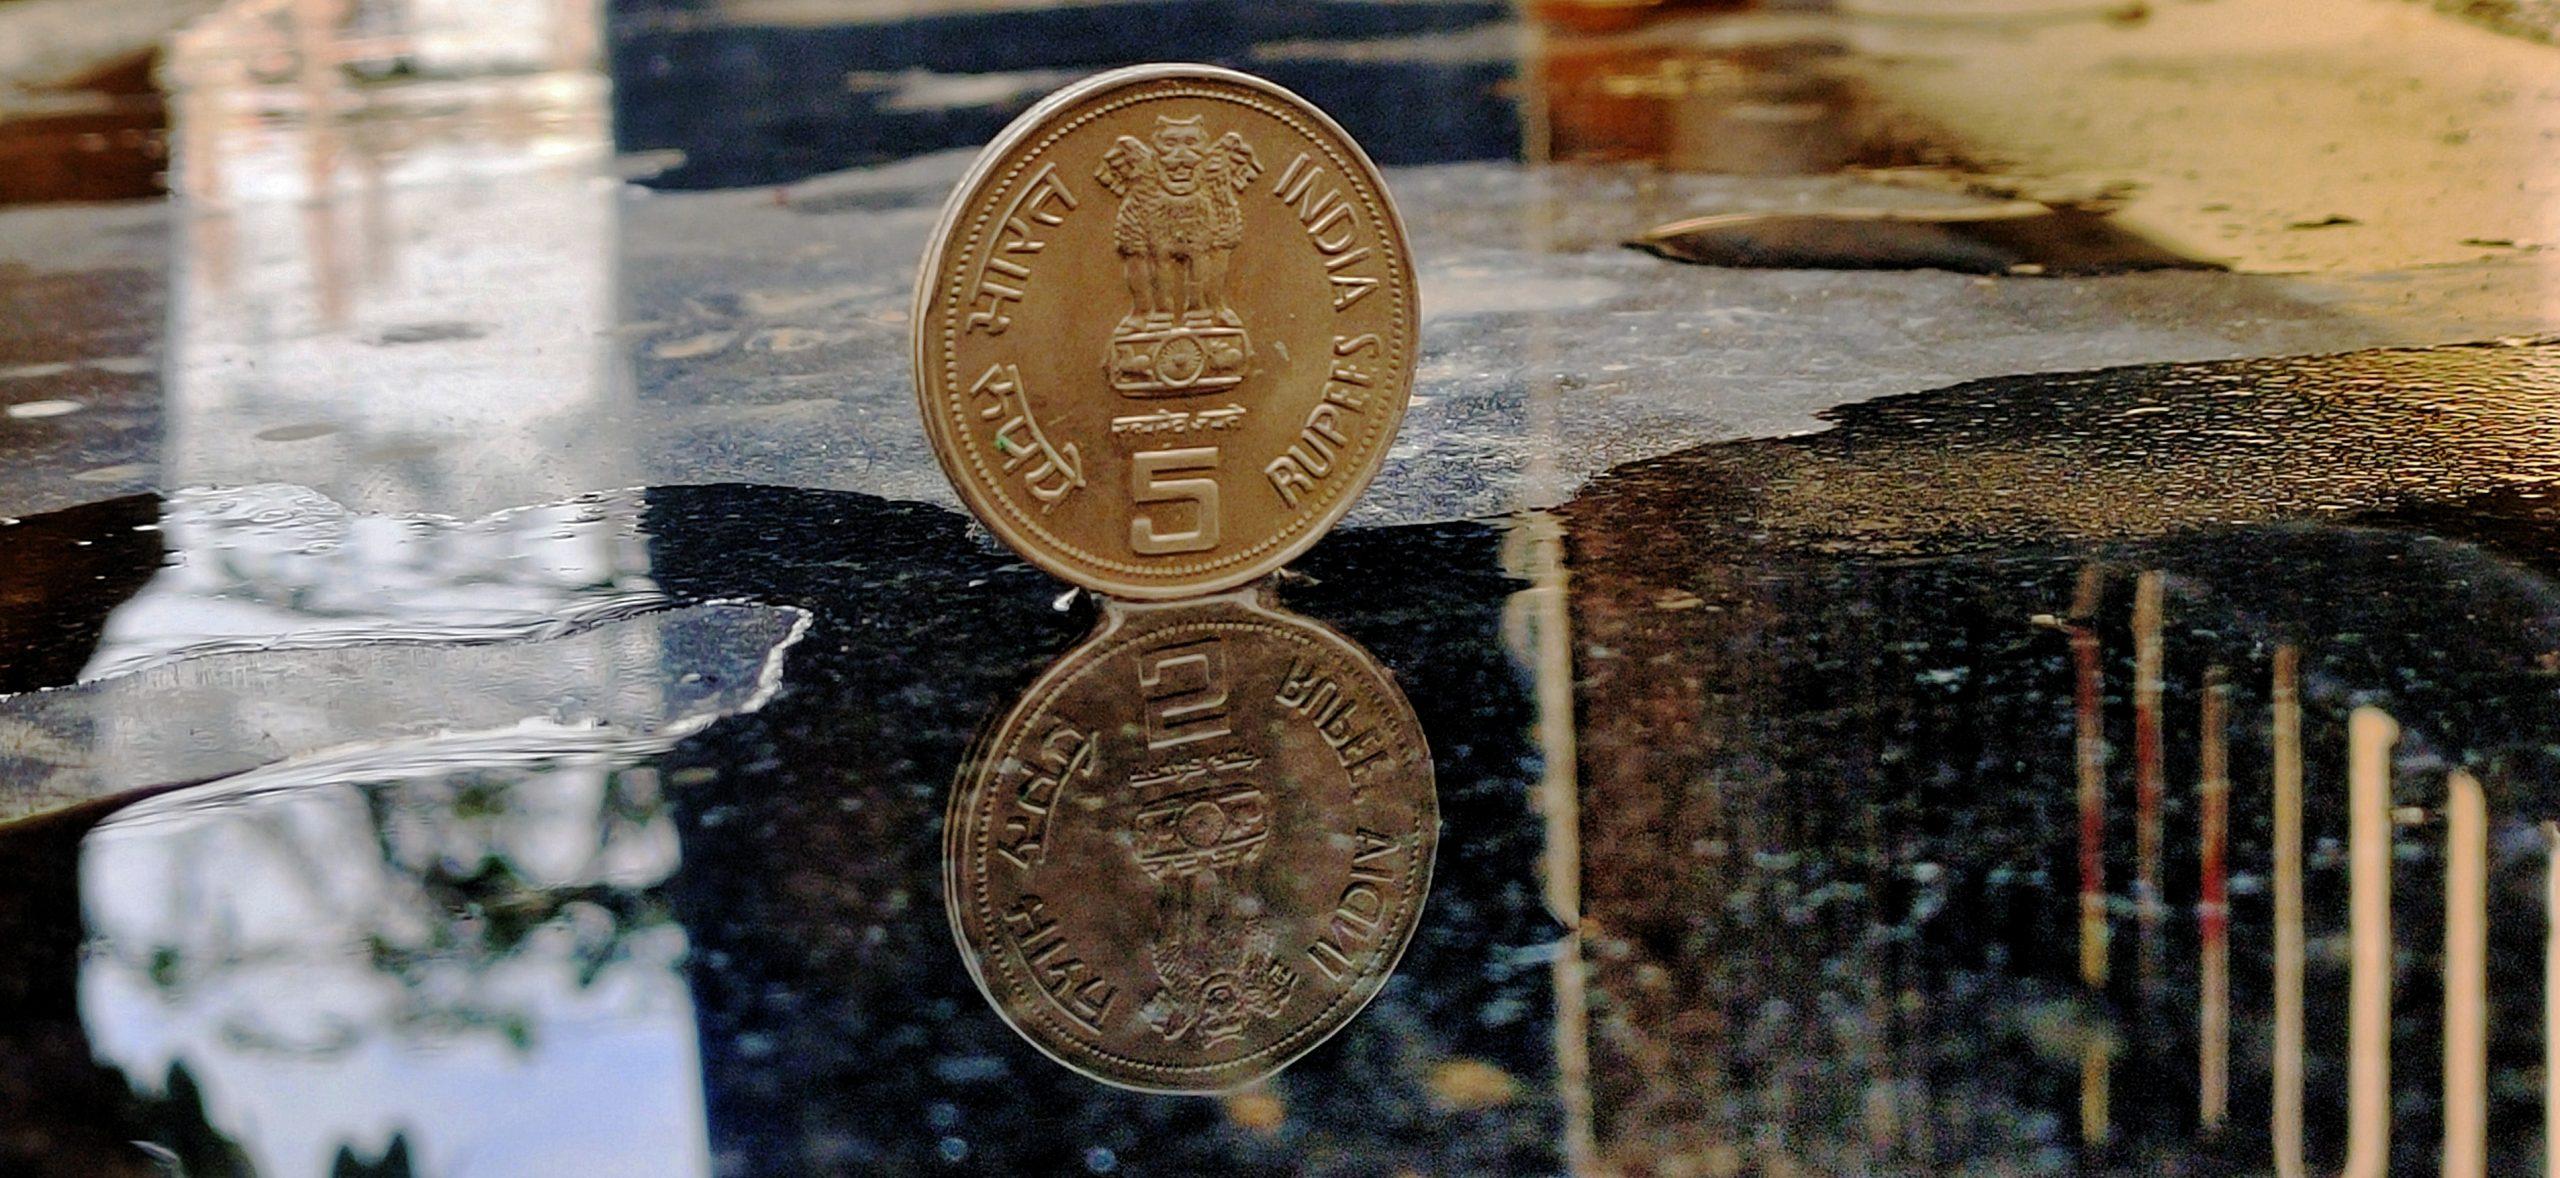 coin reflection